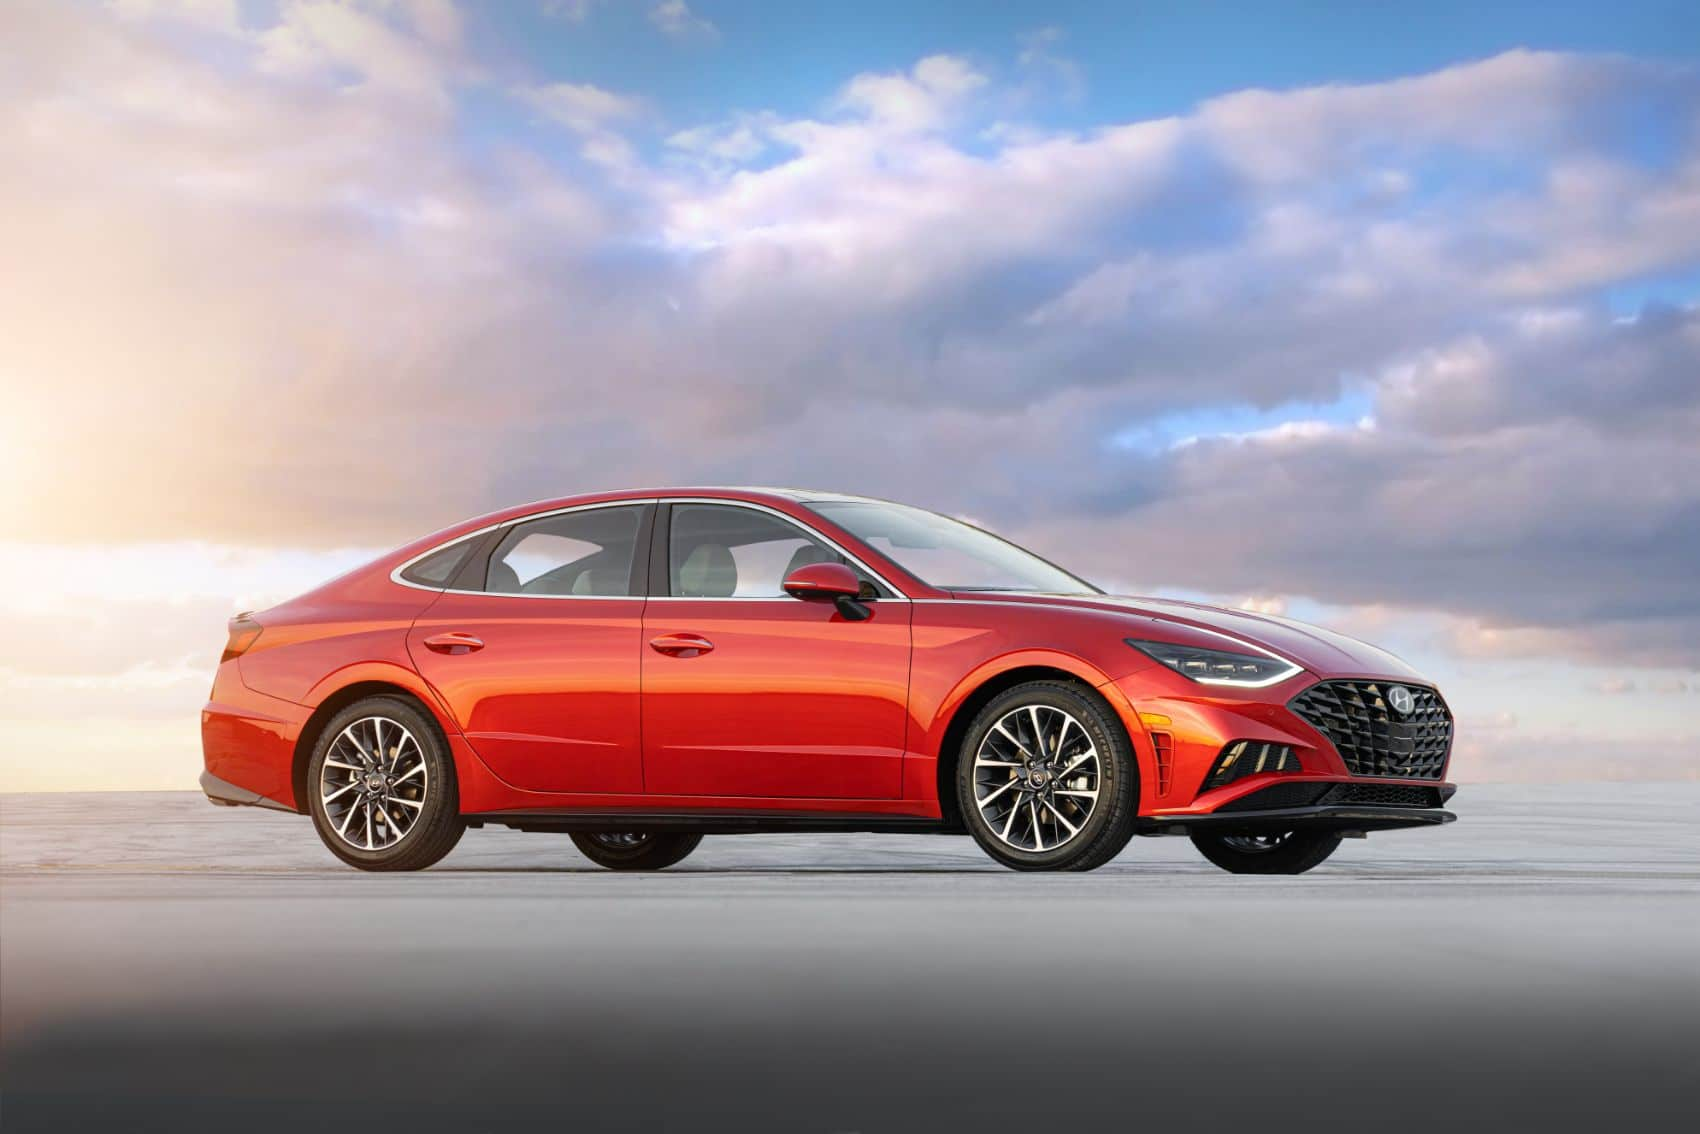 2020 Hyundai Sonata All The Details With Some Liquid Chrome